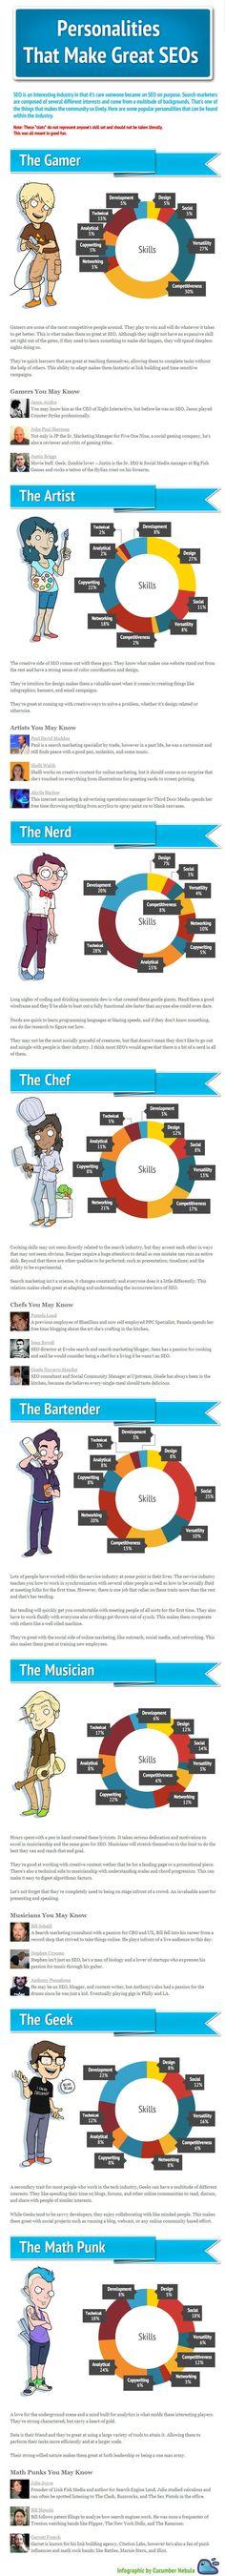 8 tipos de personalidad que hacen buen SEO #infografia #infographic #seo